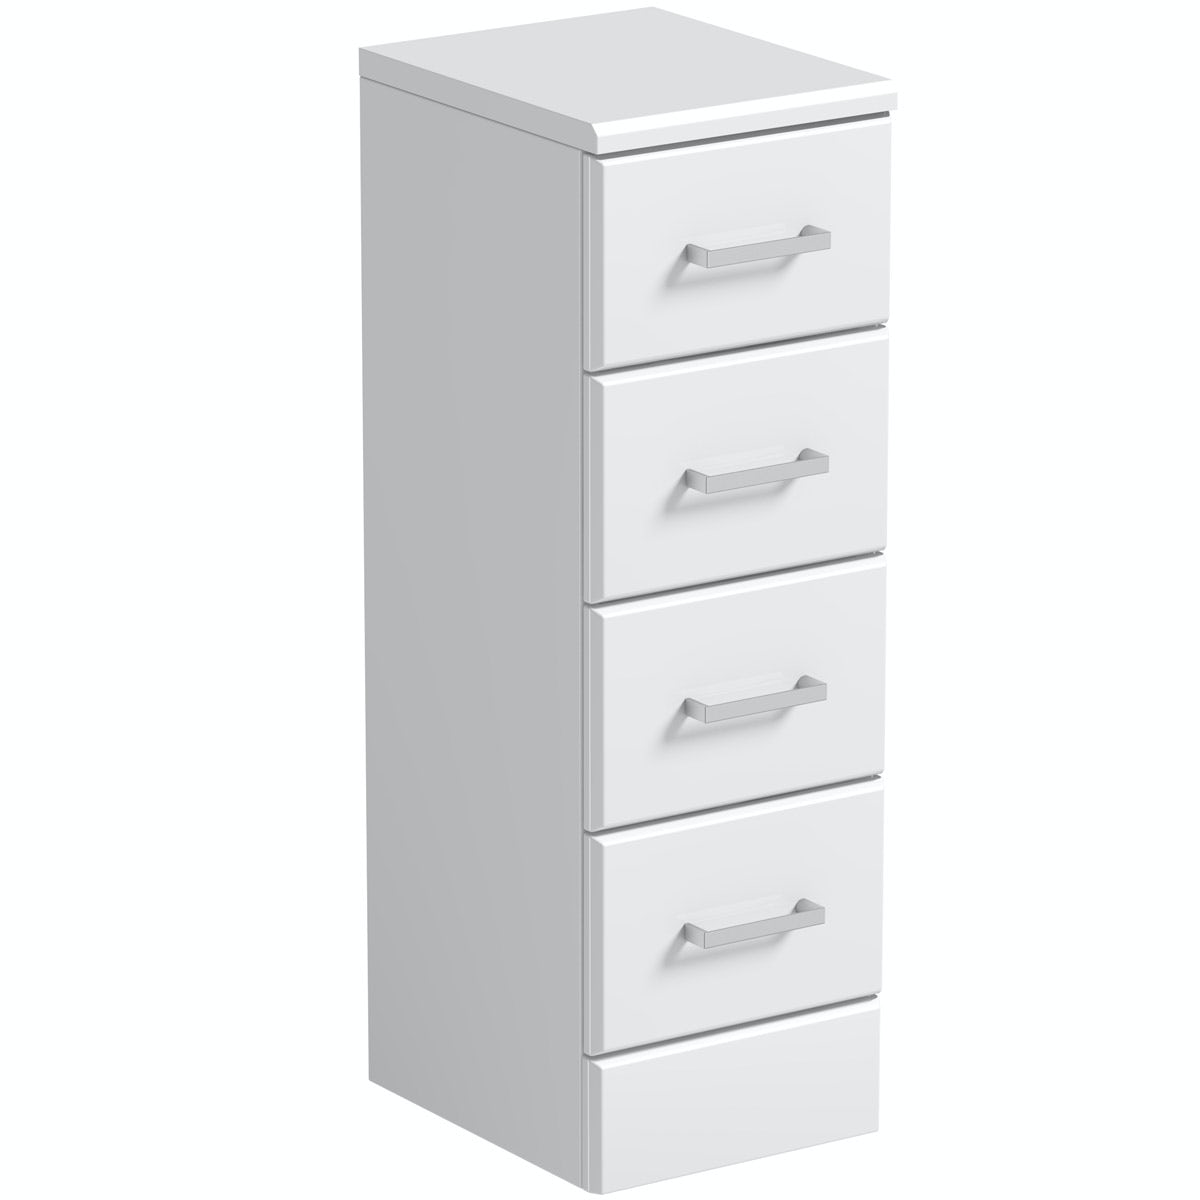 Orchard Eden white multi drawer unit 300mm